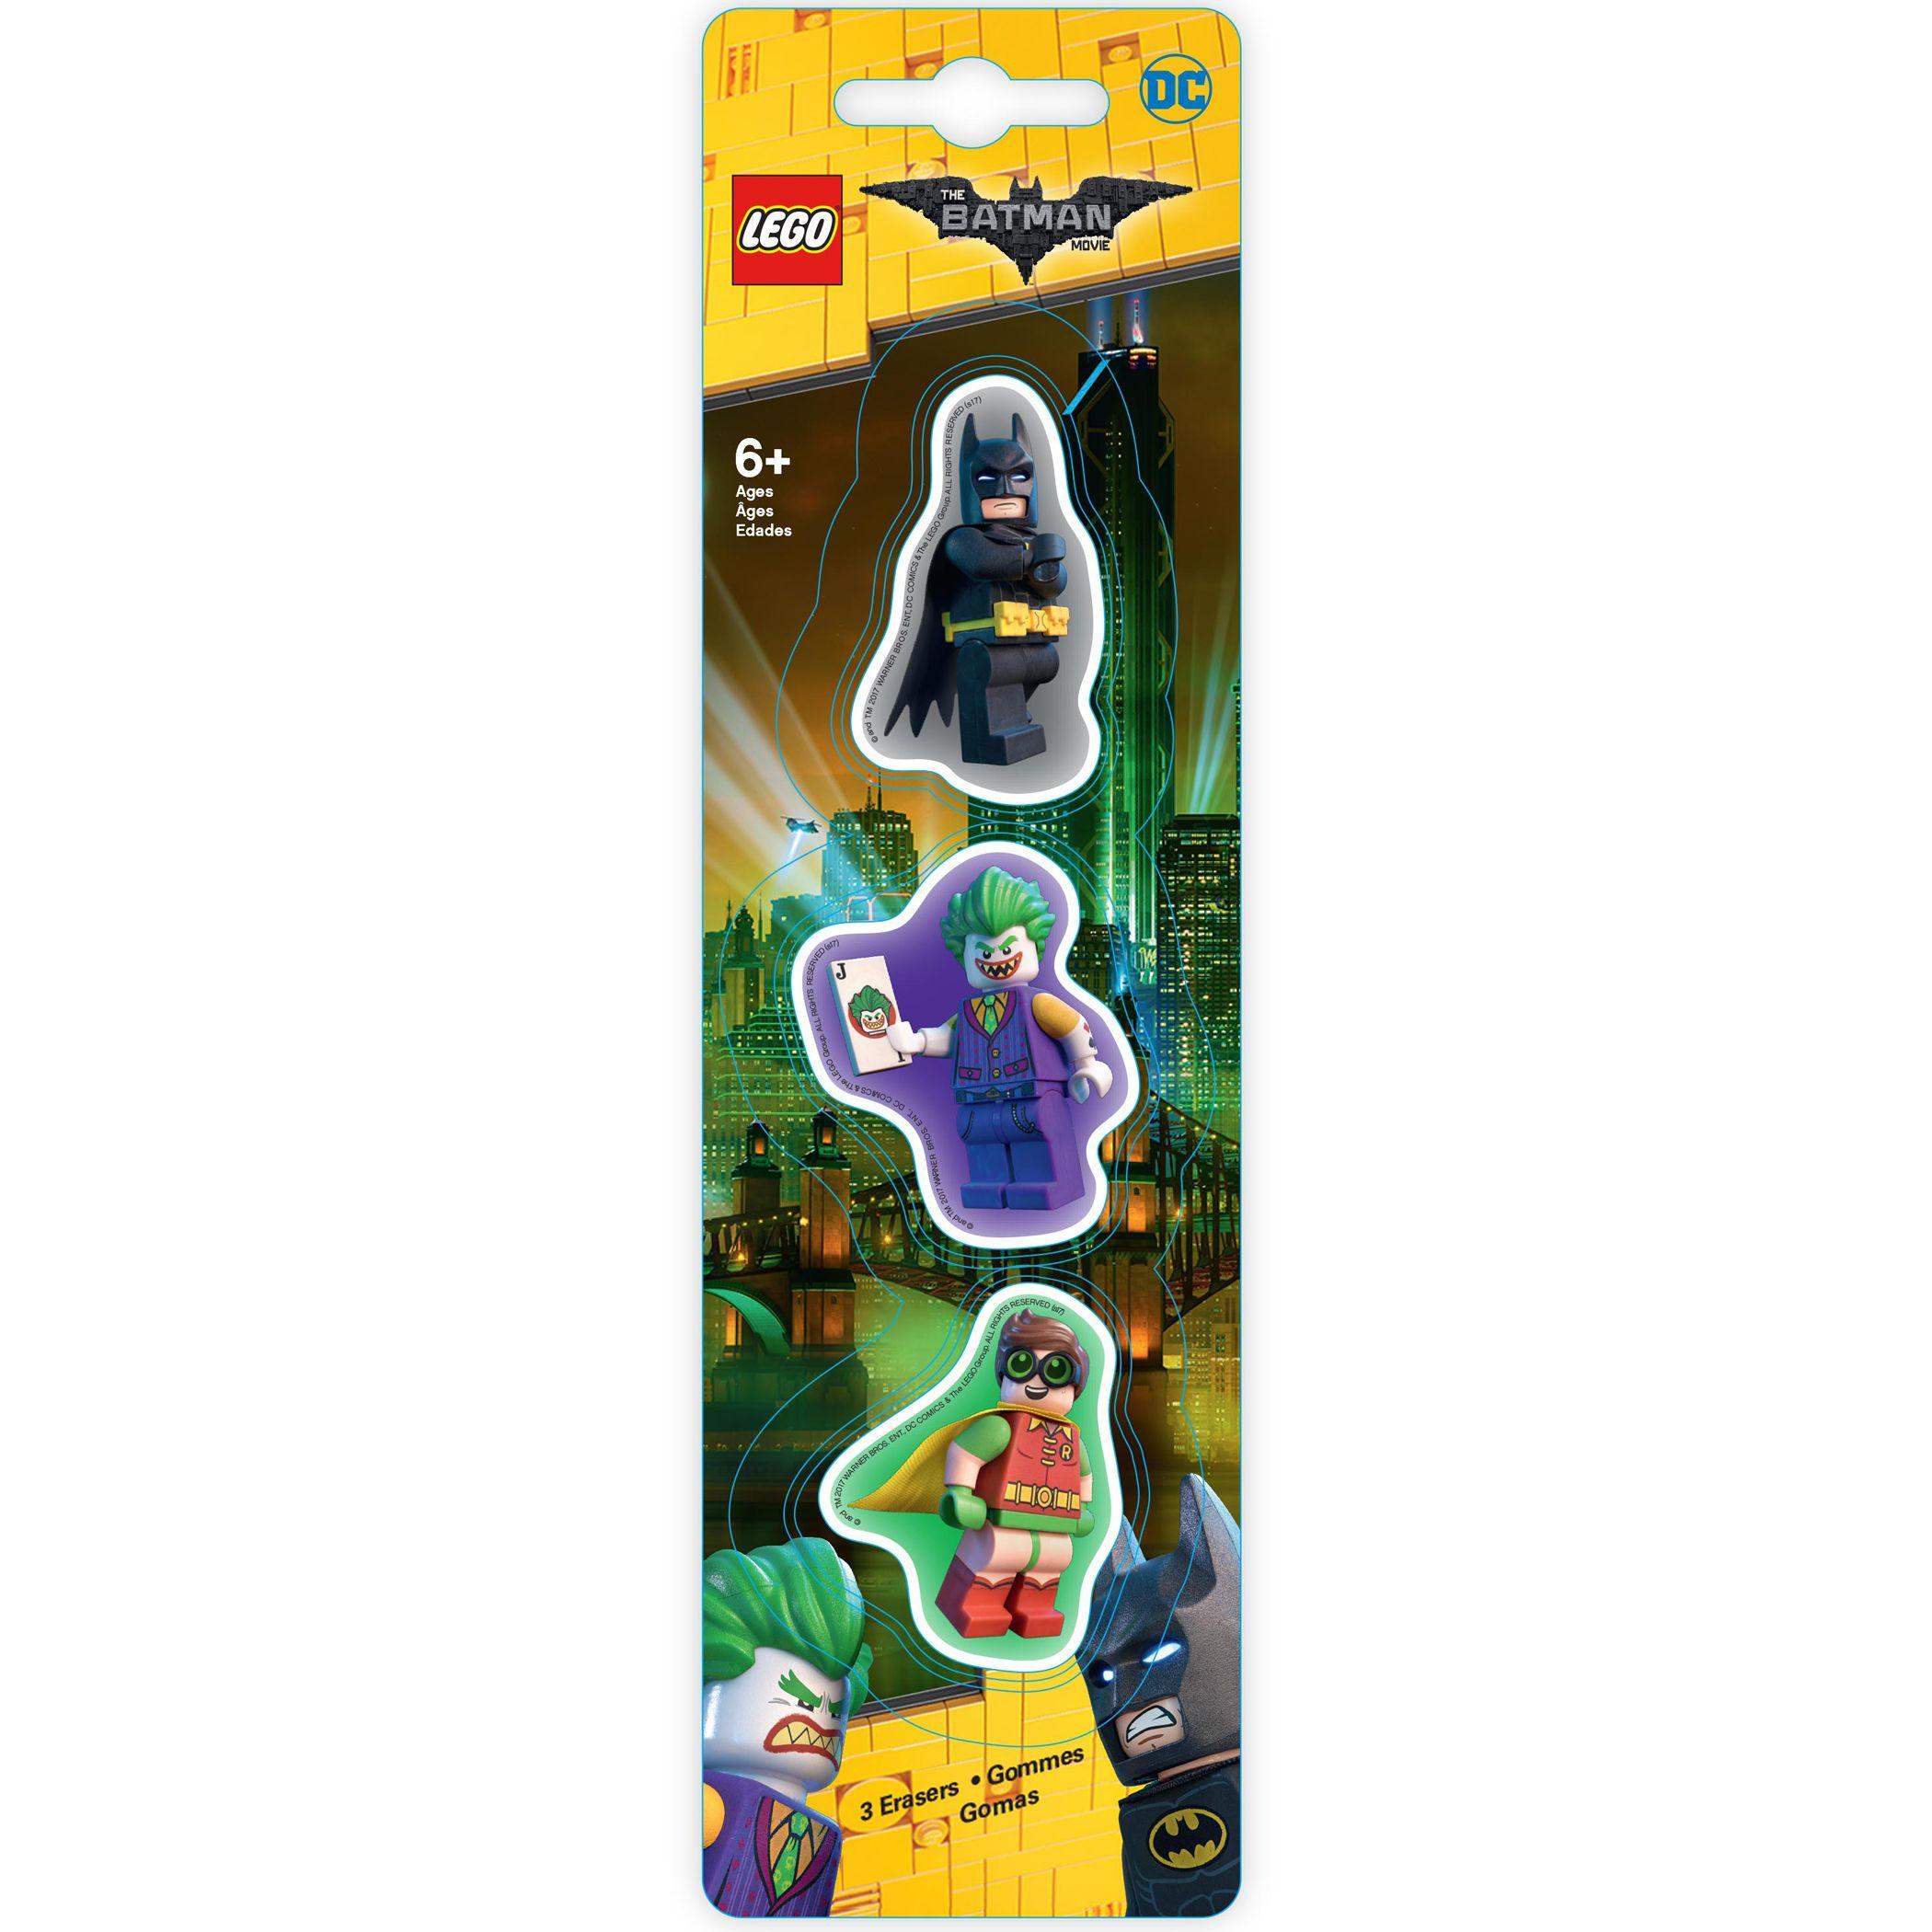 Lego LEGO The LEGO Batman Movie Erasers, Pack of 3